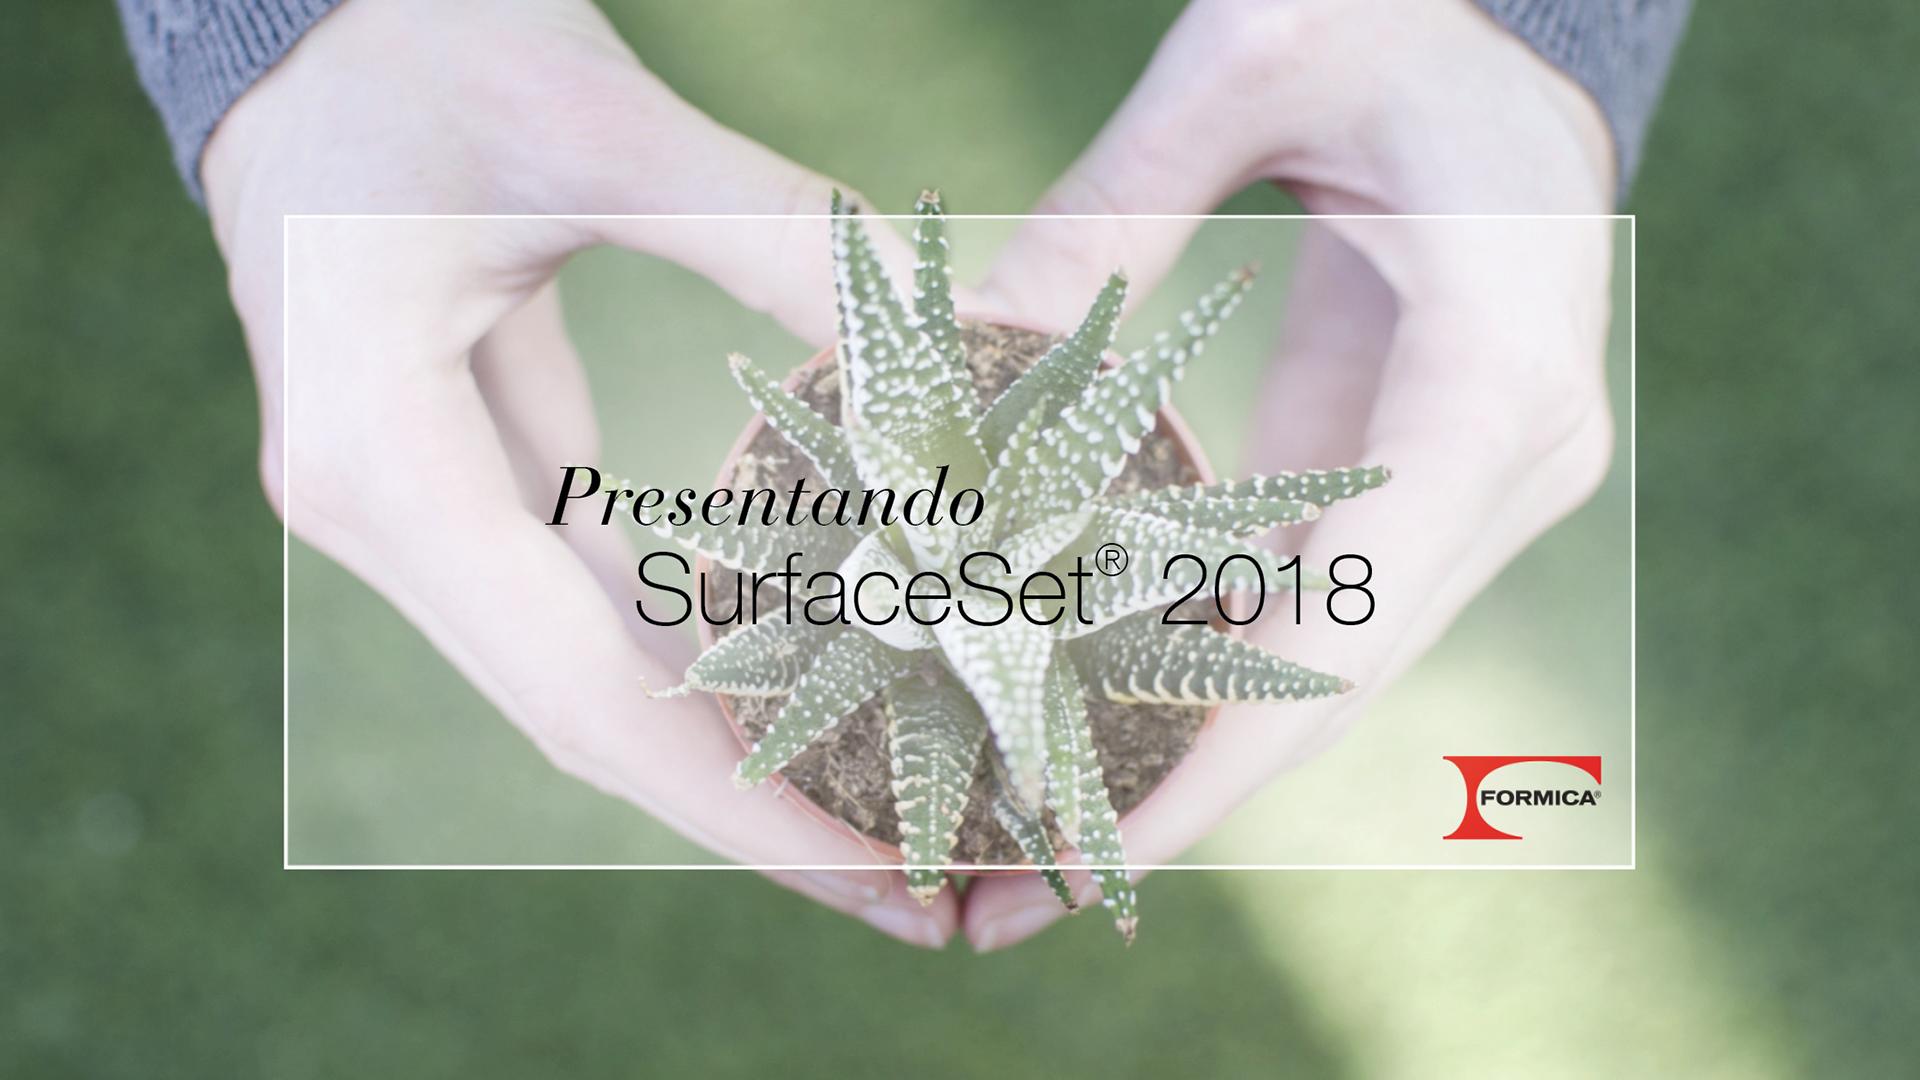 Presentando SurfaceSet 2018